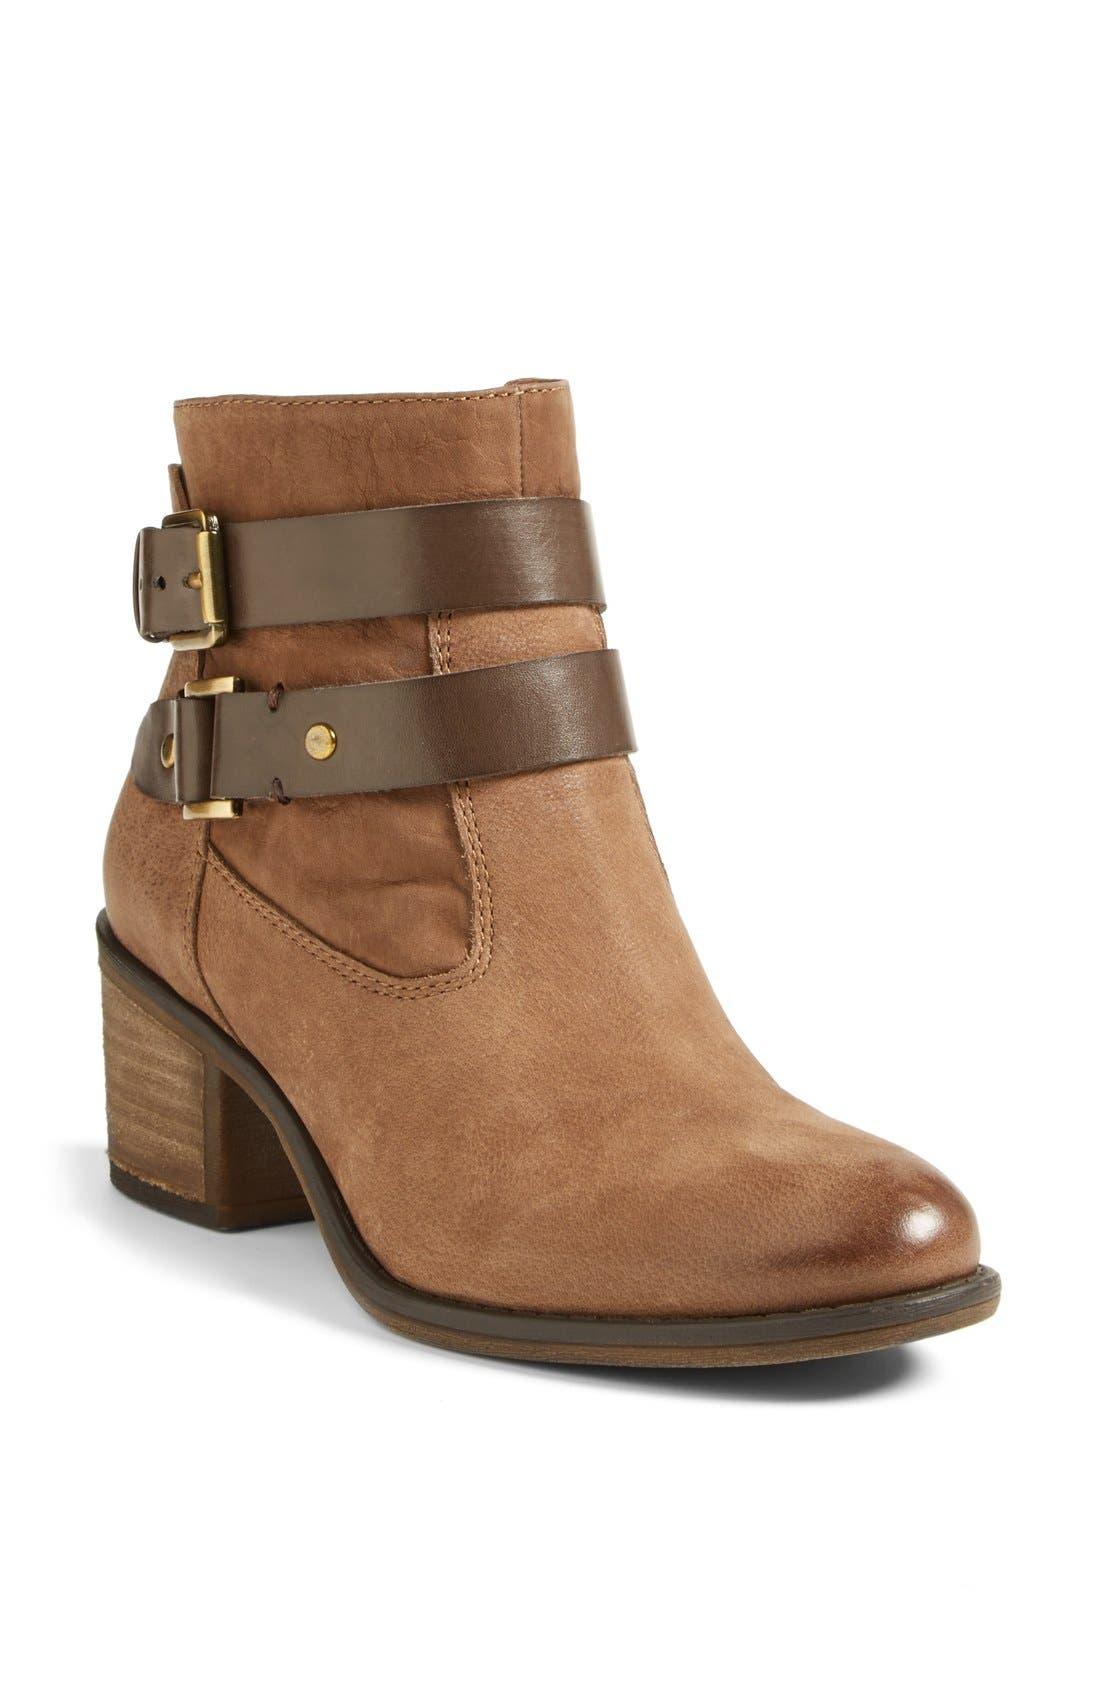 Alternate Image 1 Selected - Franco Sarto 'Linden' Leather Bootie (Women) (Nordstrom Exclusive)